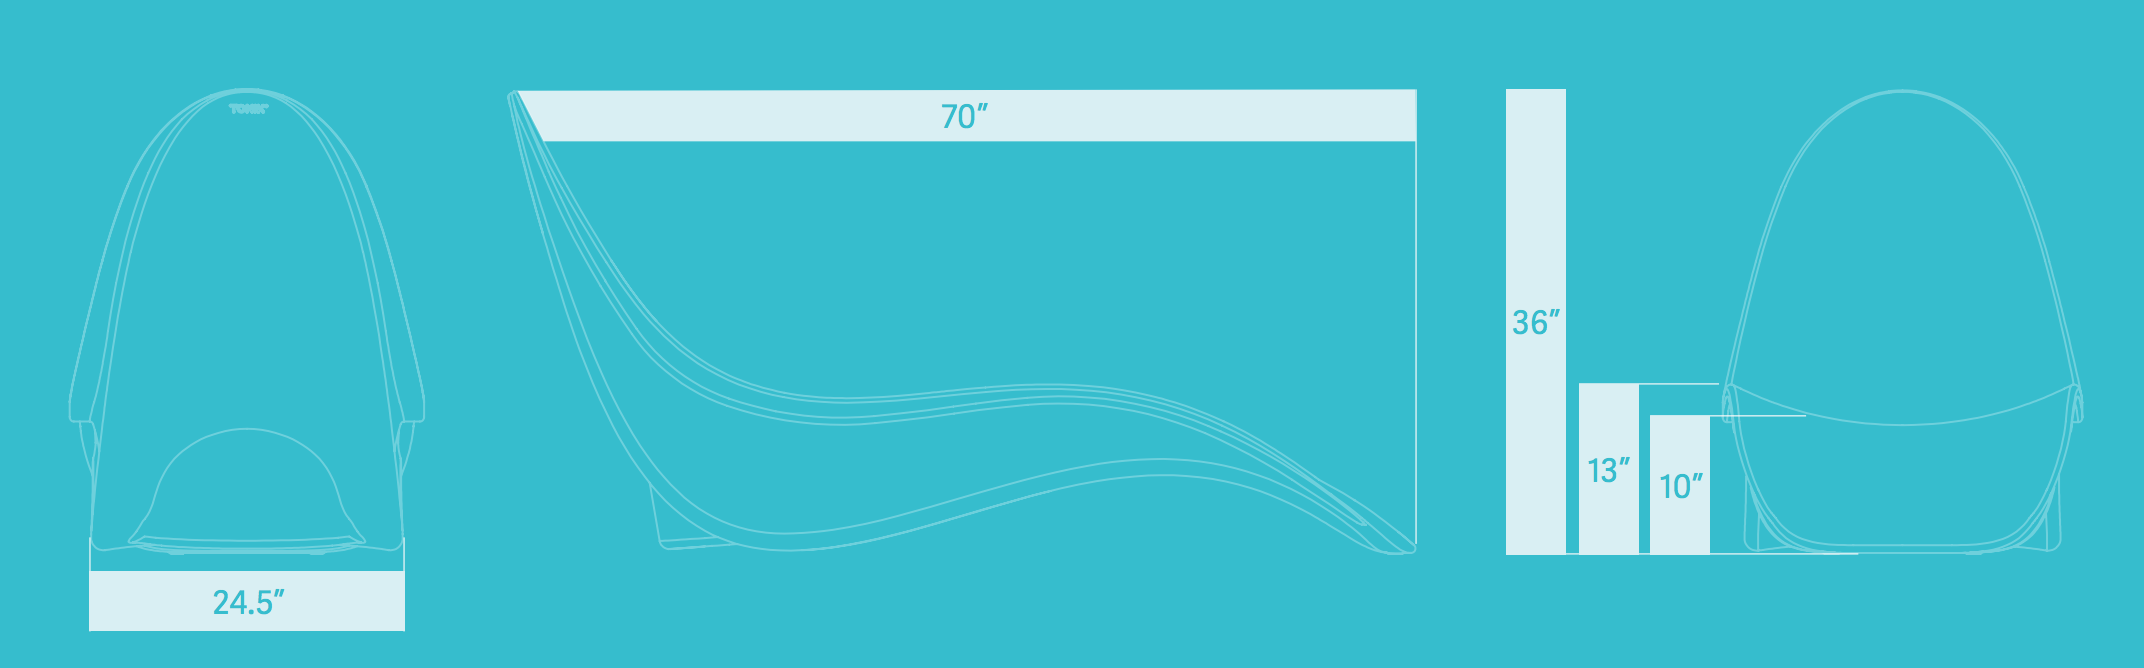 bikini-chaise dimensions and water depth